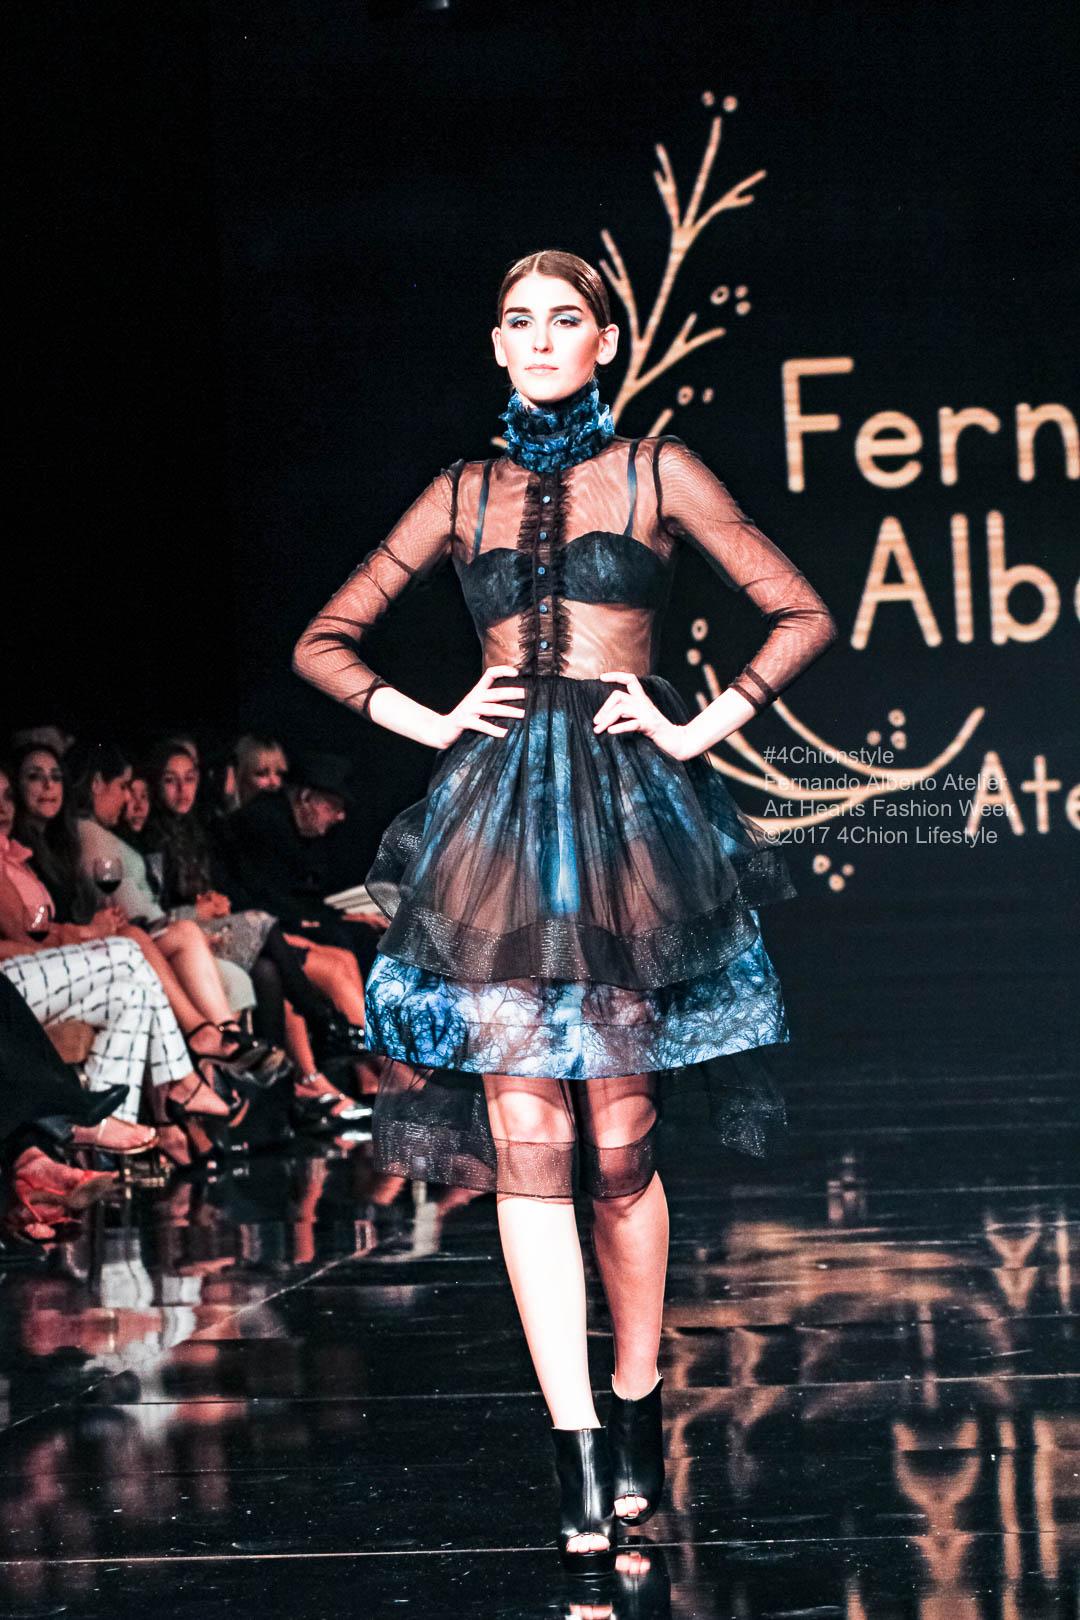 Fernando Alberto fashion FW17 Art Hearts Fashion Week 4Chion LIfestyle